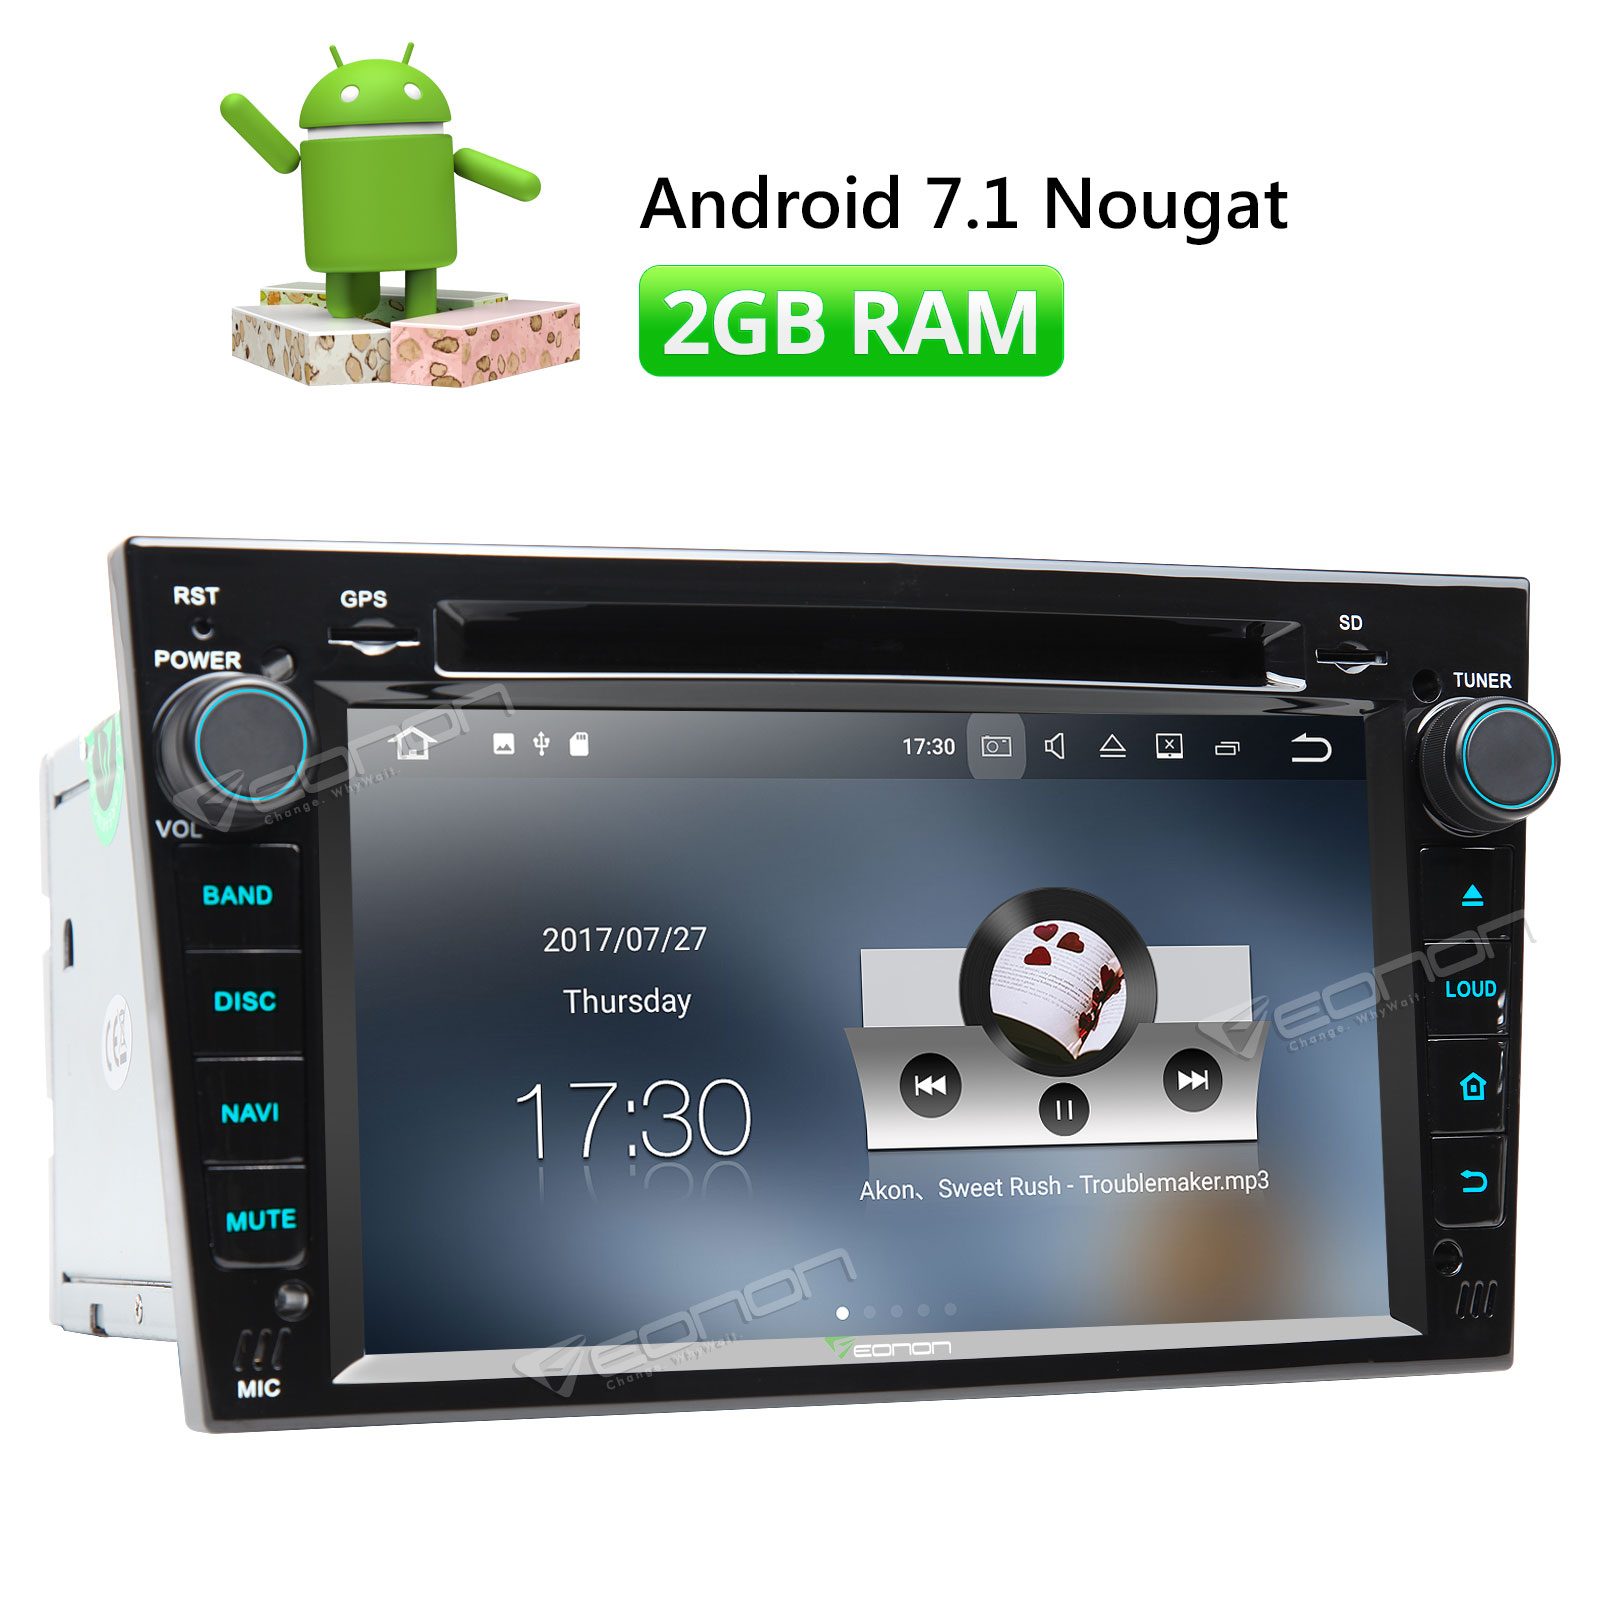 eonon black ga8156 7 android 7 1 in dash car stereo gps navigator radio for opel [ 1600 x 1600 Pixel ]